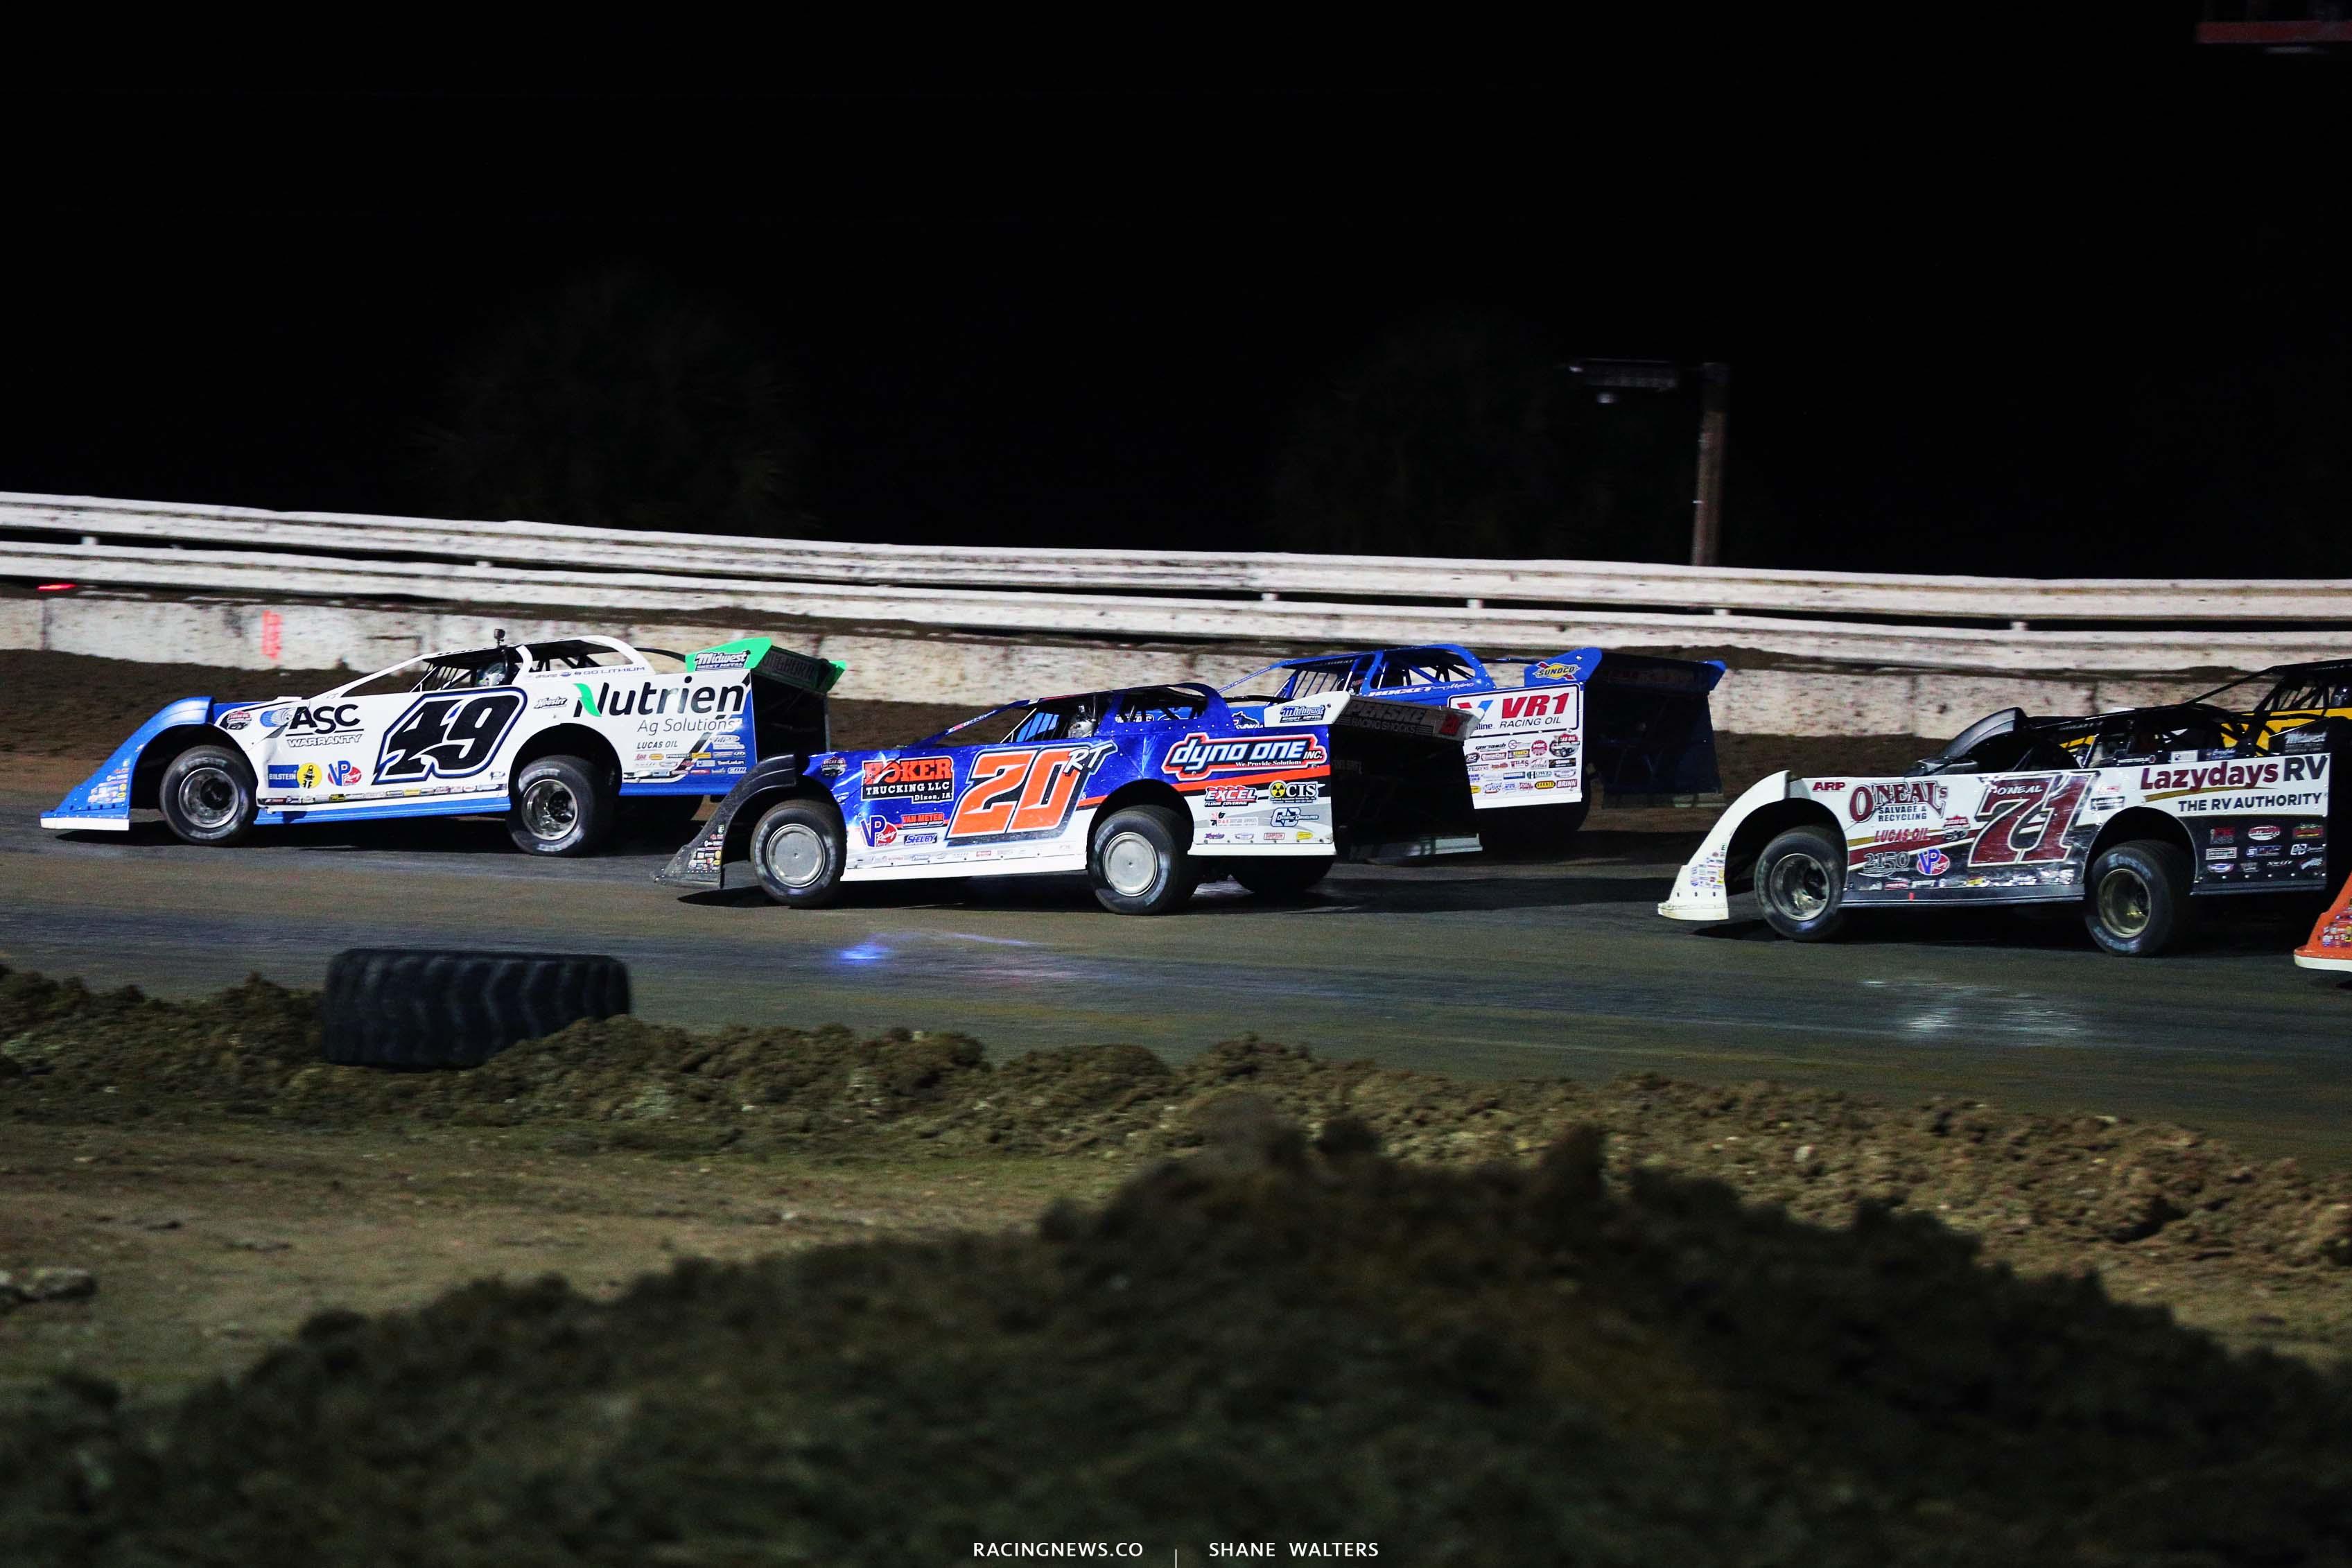 Jonathan Davenport, Ricky Thornton Jr, Brandon Sheppard and Hudson O'Neal at Bubba Raceway Park - Lucas Oil Late Model Dirt Series 9111